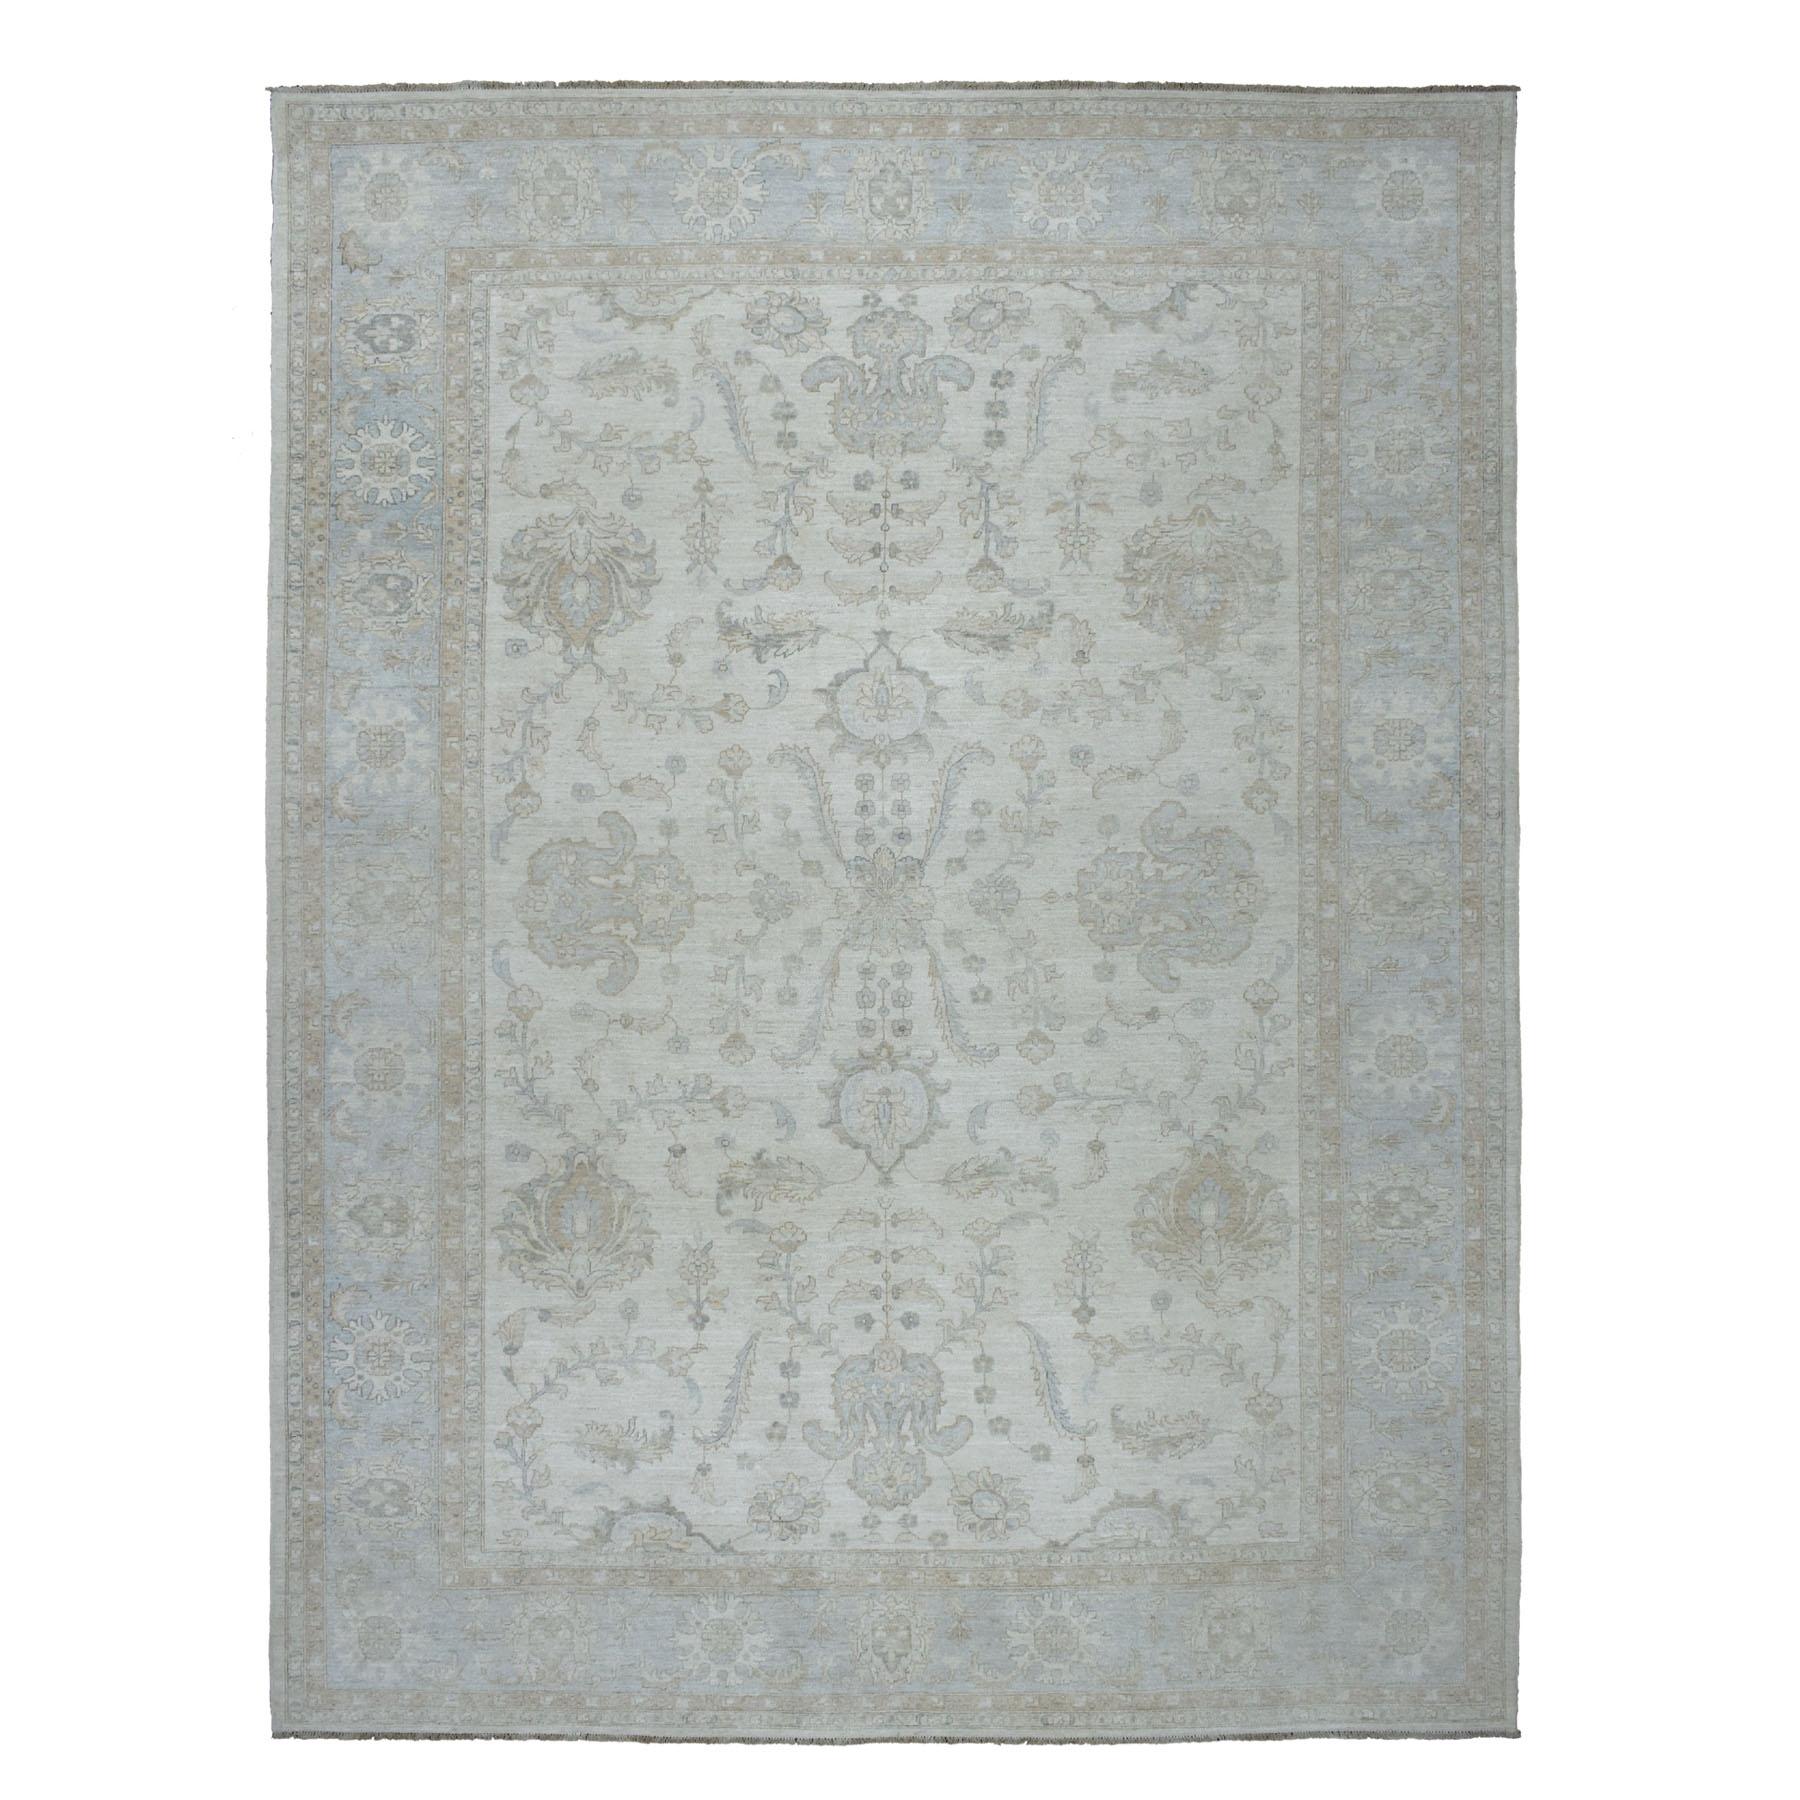 "10'X13'10"" White Wash Peshawar Pure Wool Hand Knotted Oriental Rug moaeb6ba"